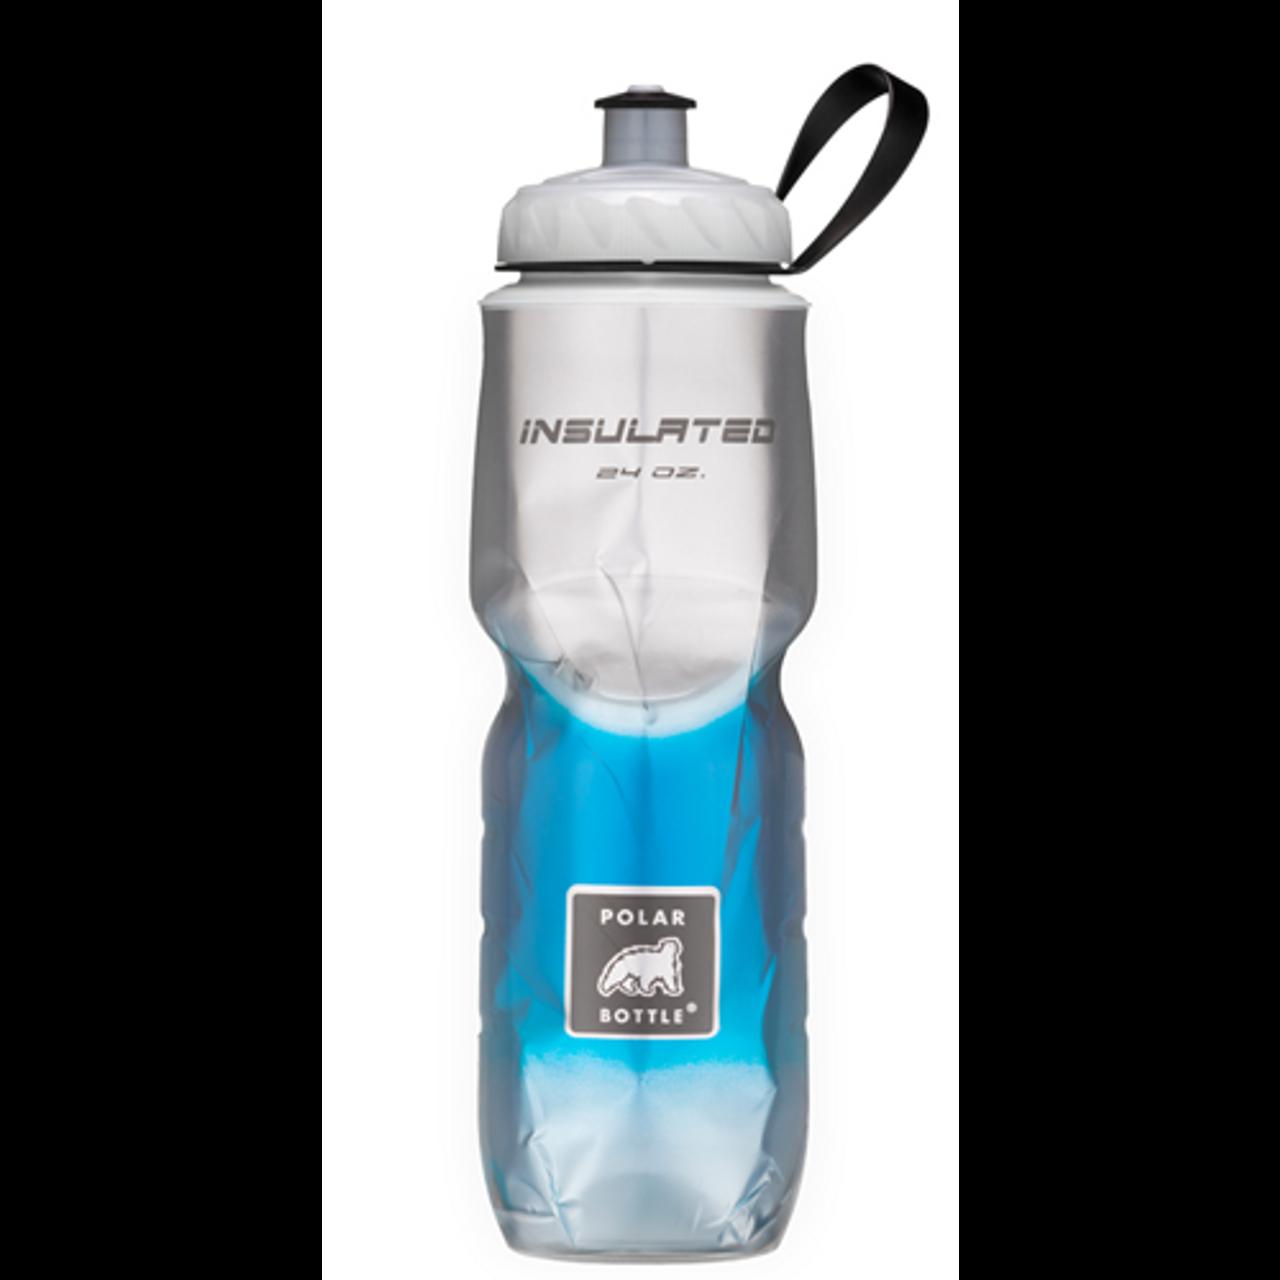 Polar Water Bottle  24 oz  Blue